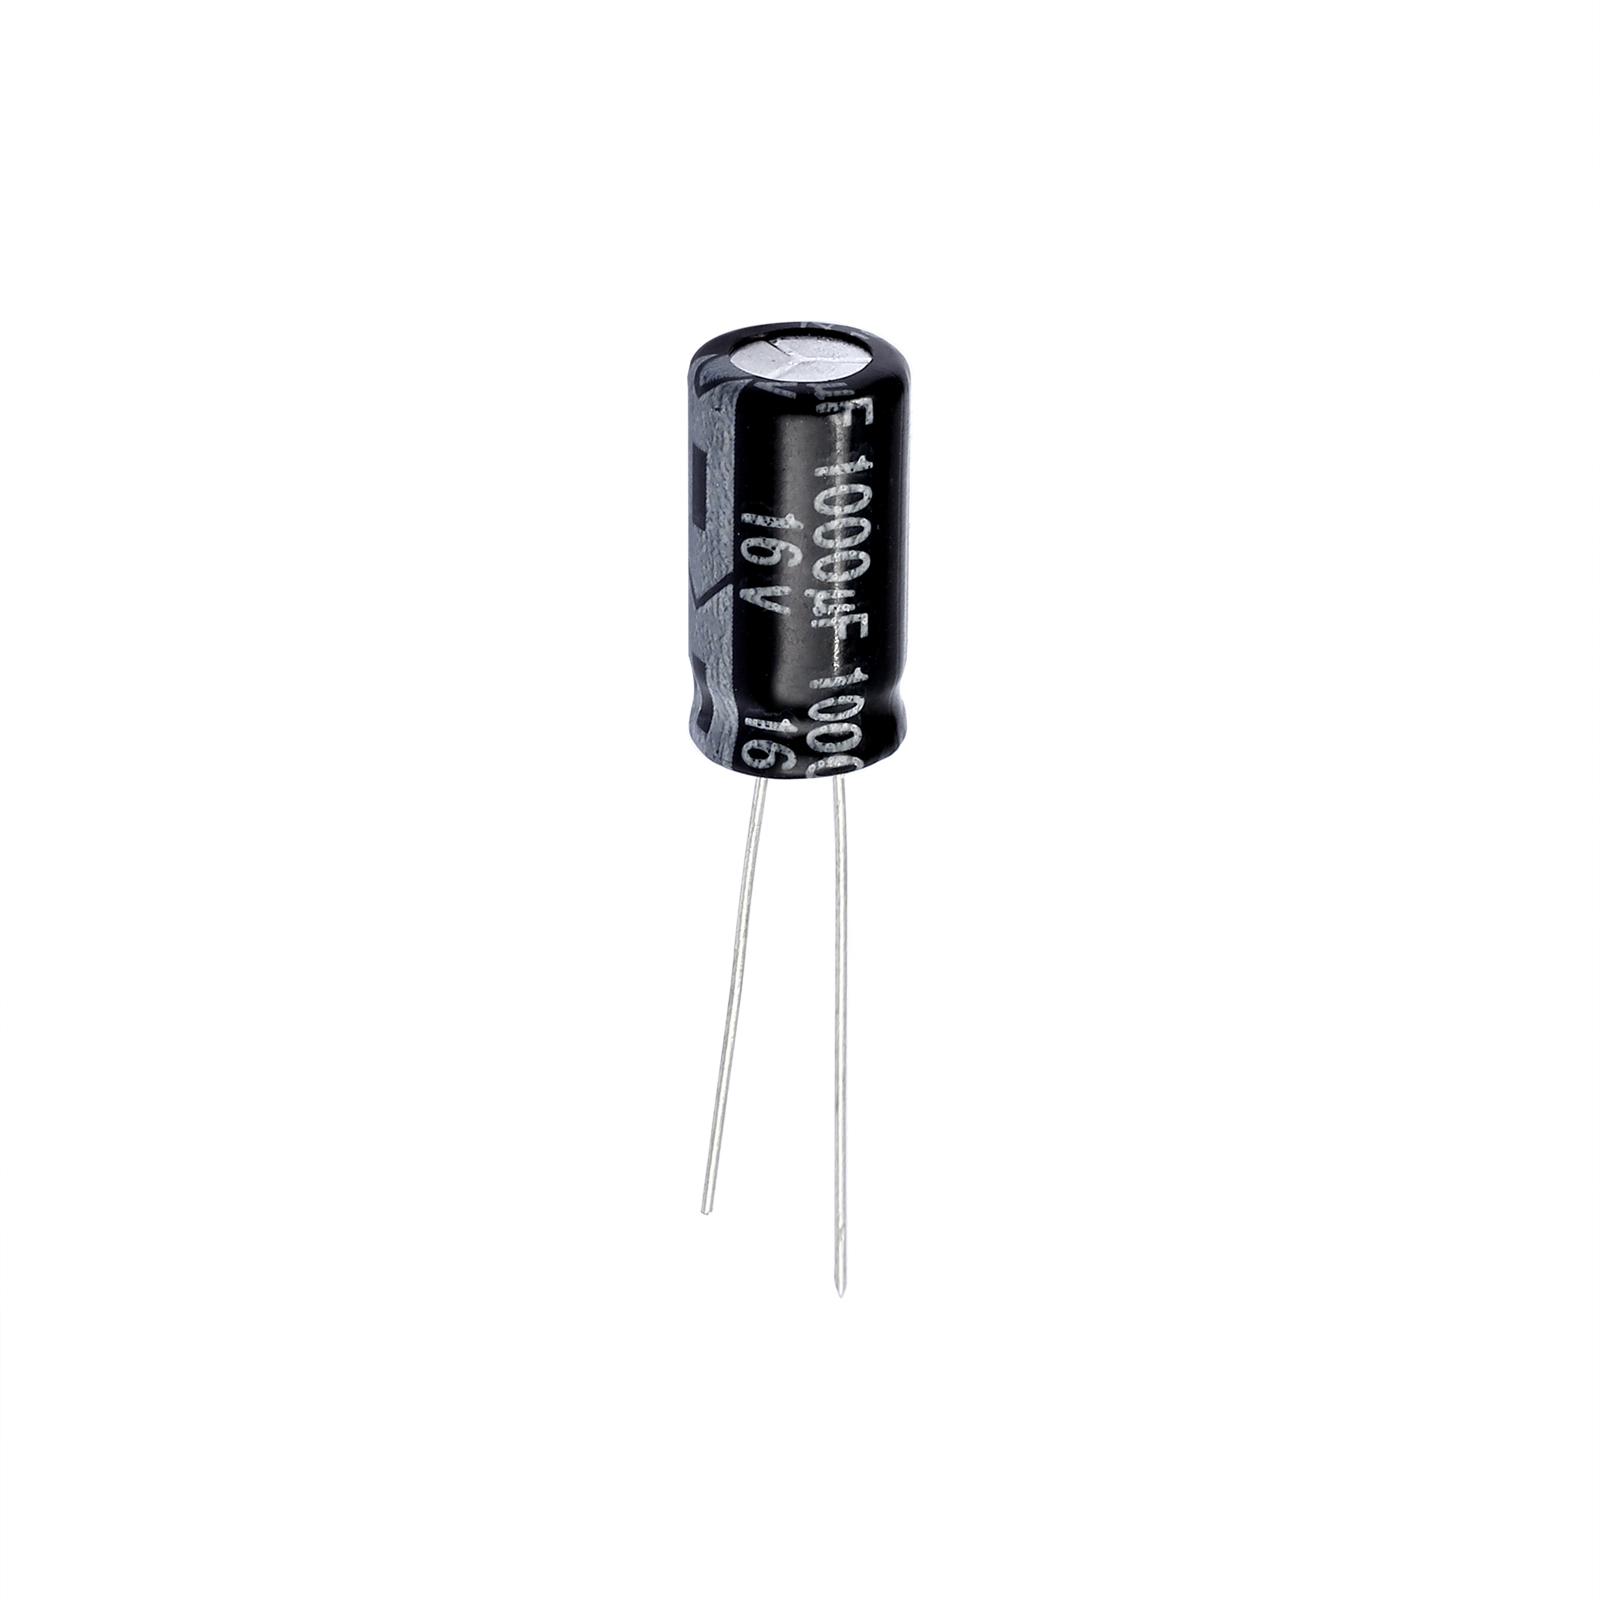 25v 25 X 470uf Capacitor Electrolítico 1st Class Post máx. - 105 ° c-Uk